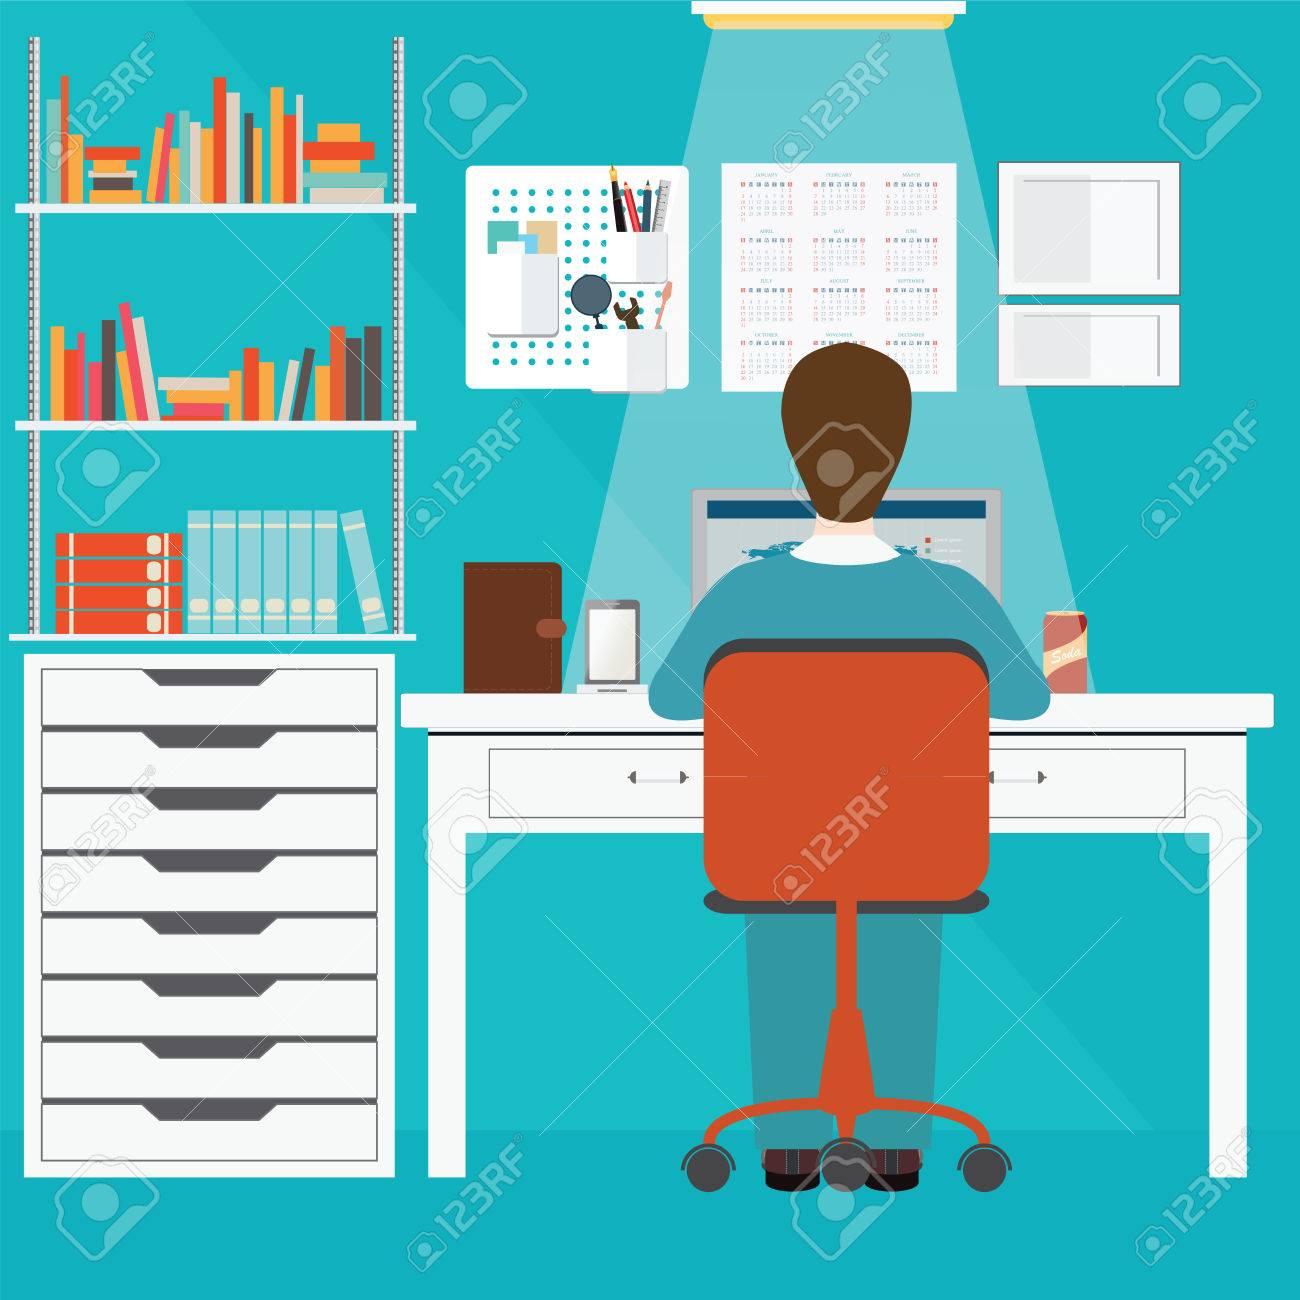 Kaufmann Arbeitet Im Büro Zu Hause, Büroleute, Büro Inter ...